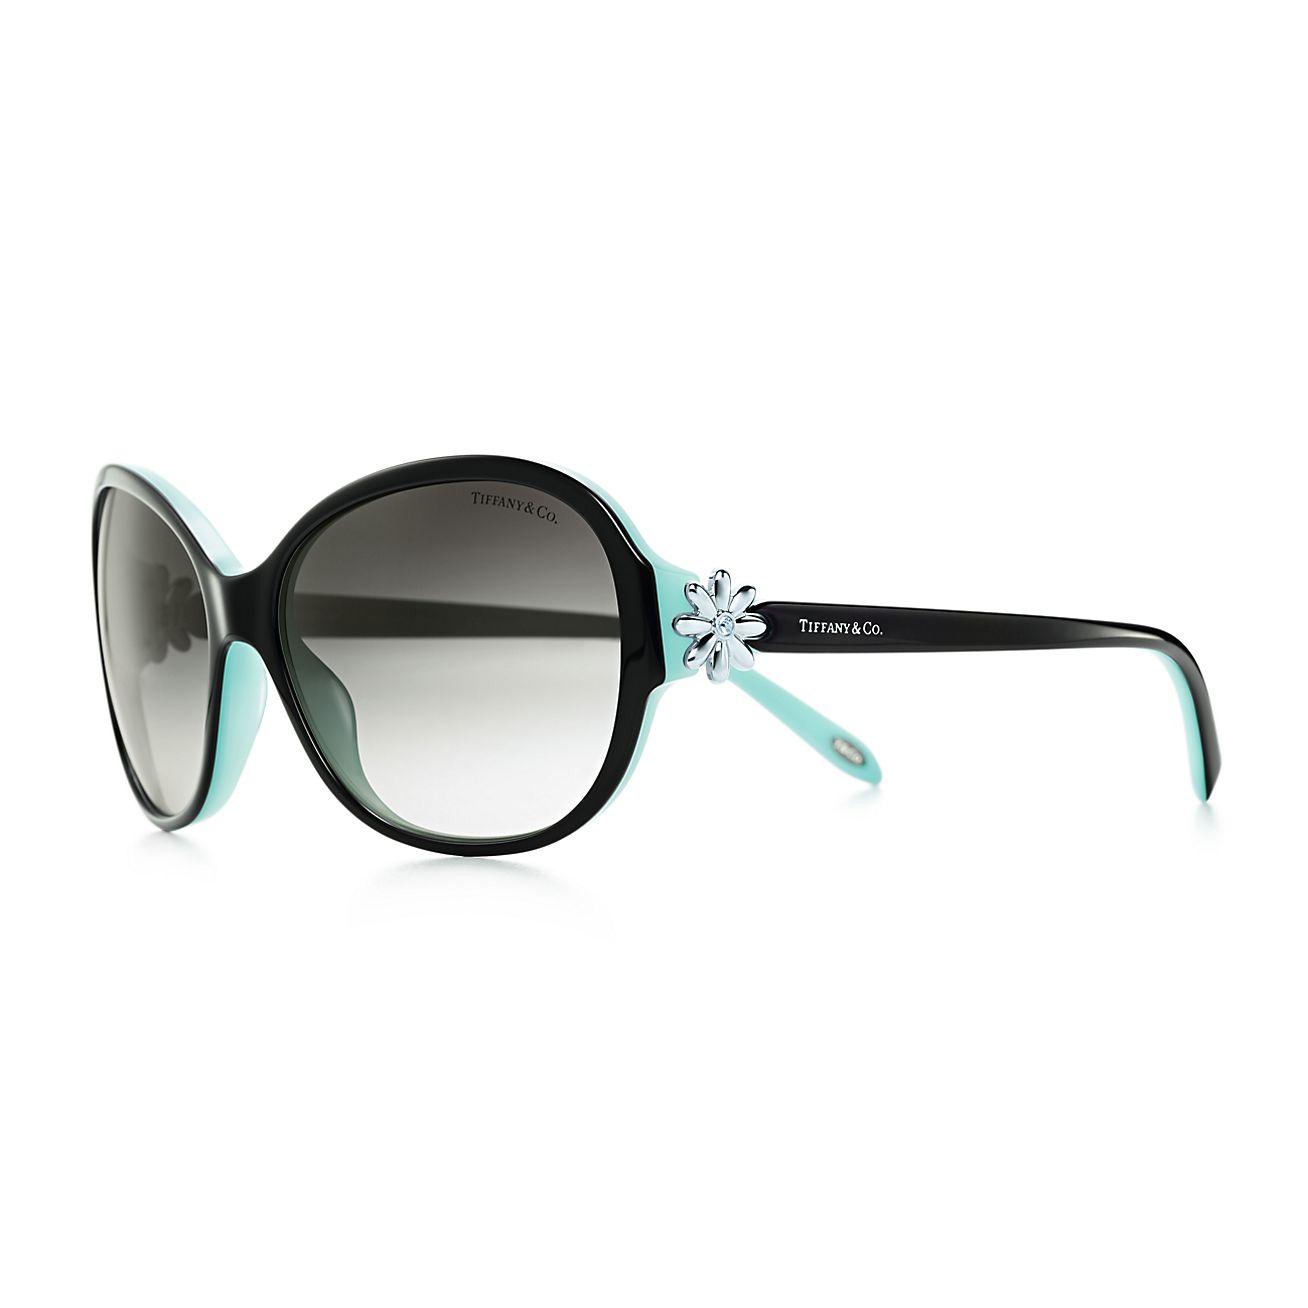 Tiffany Garden round sunglasses in Tiffany Blue acetate ...